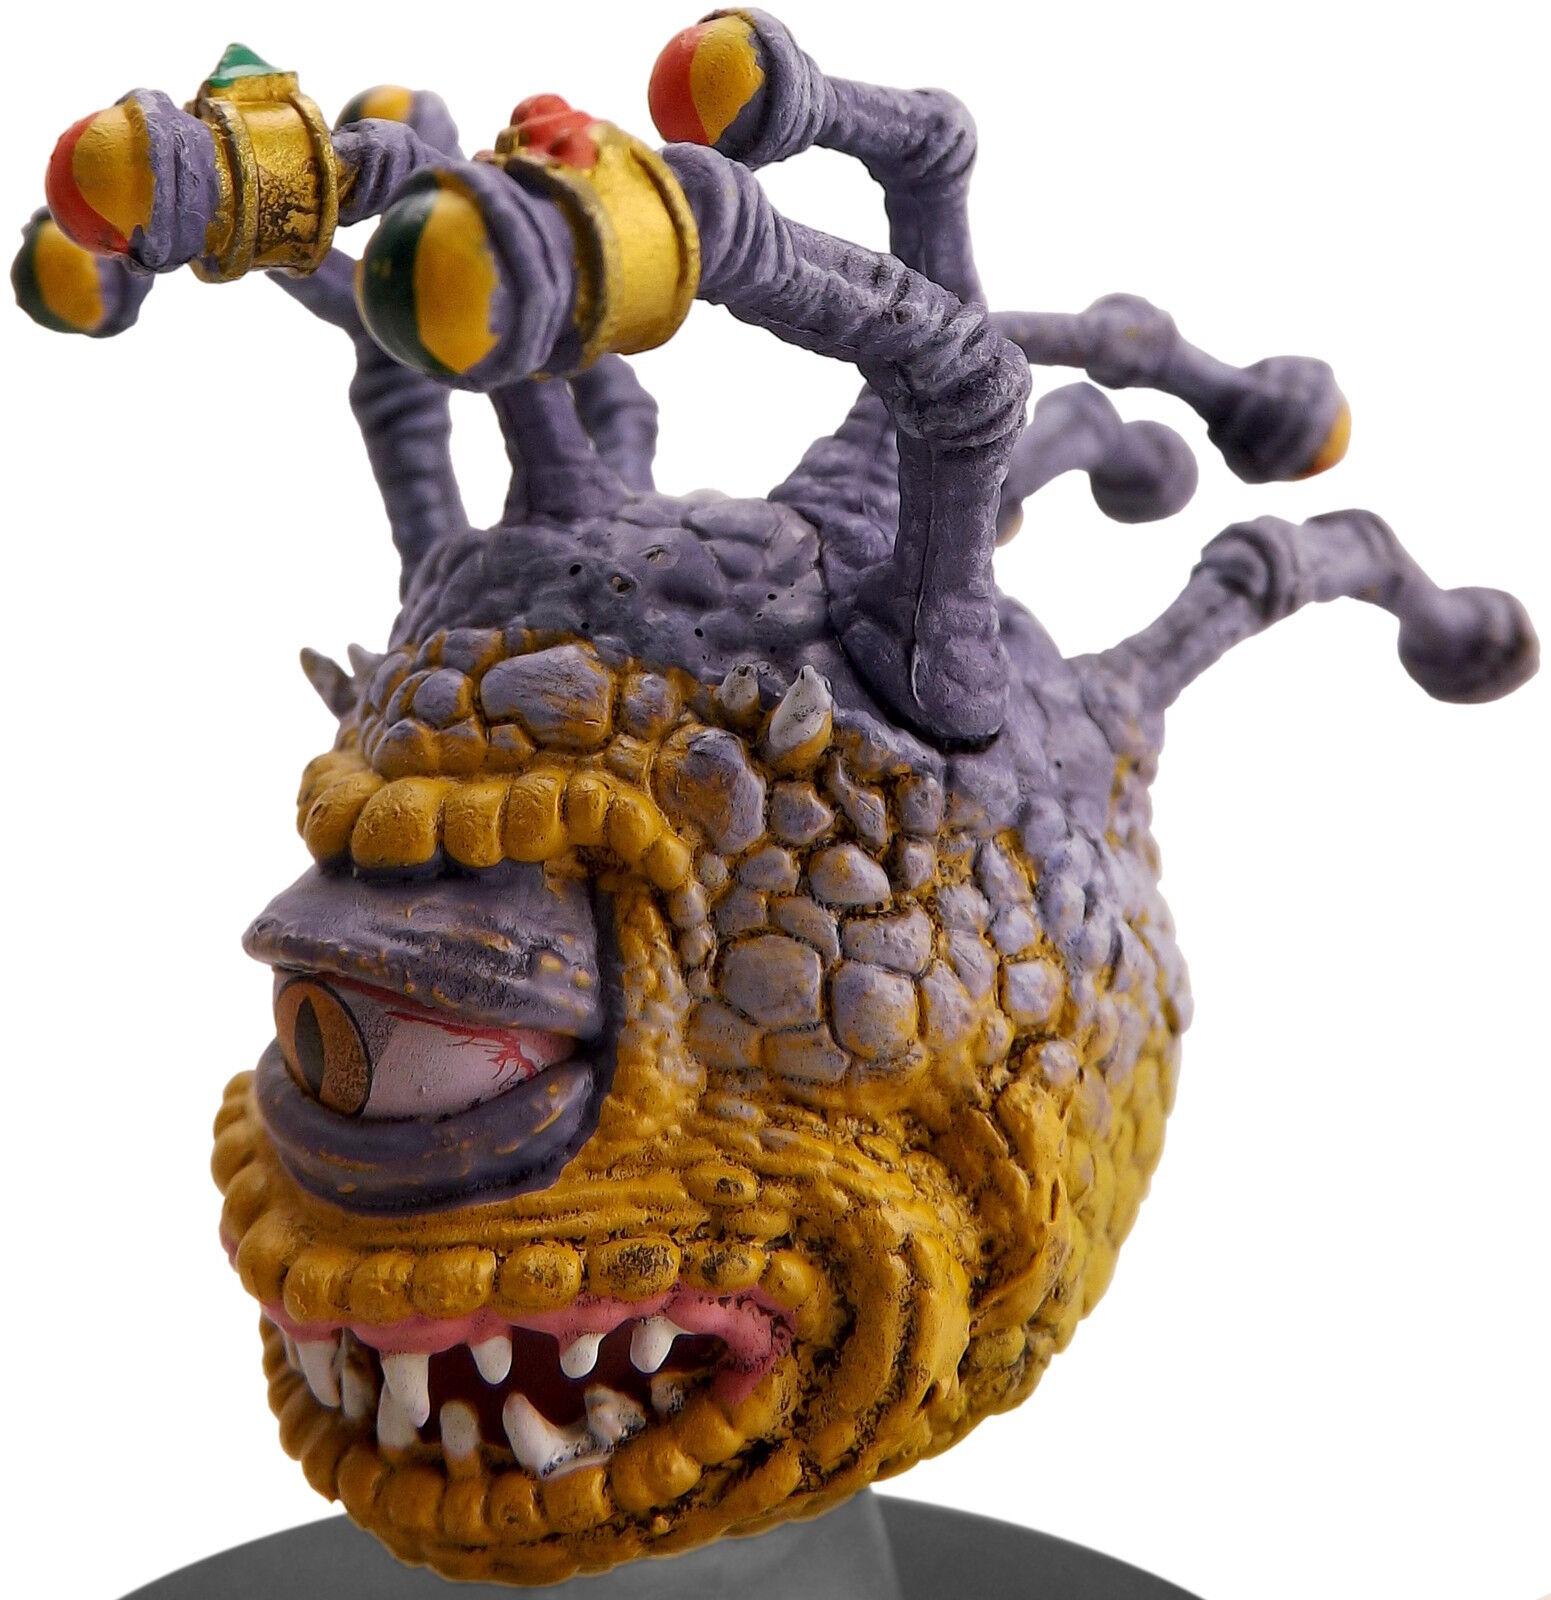 D&D mini XANATHAR XANATHAR XANATHAR (Beholder) Waterdeep Dungeons & Dragons Pathfinder Miniature ba96cd